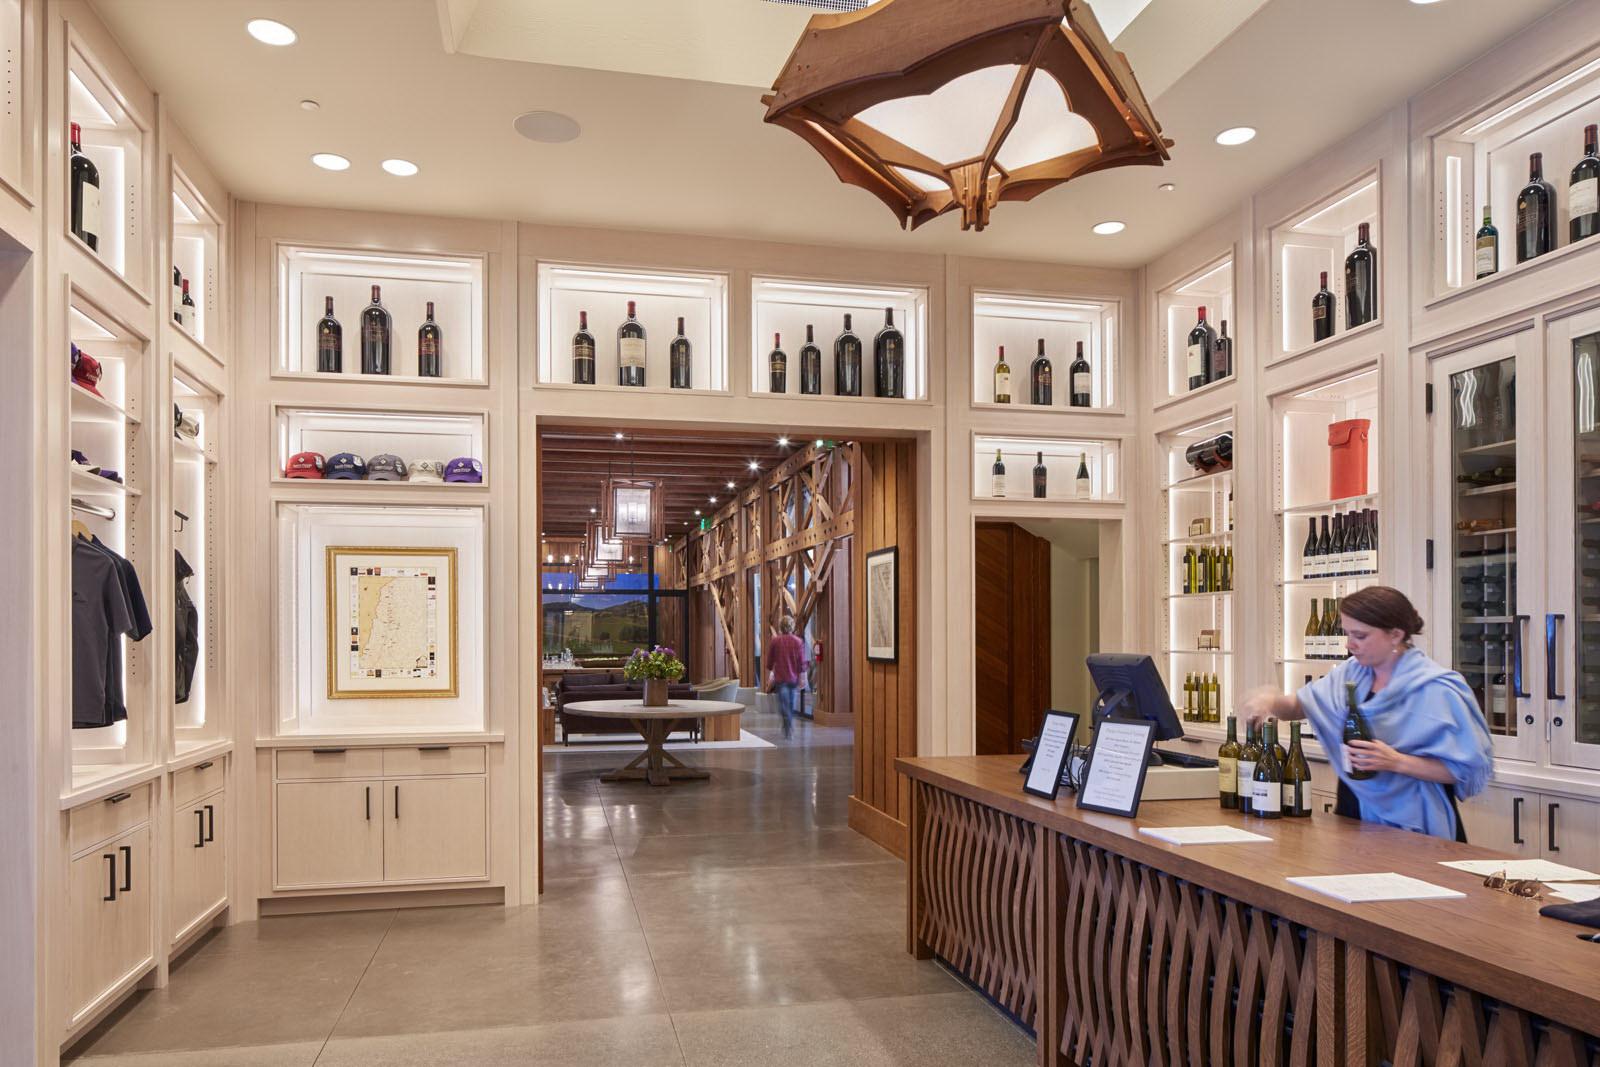 Joseph Phelps Vineyards by BCV Architects